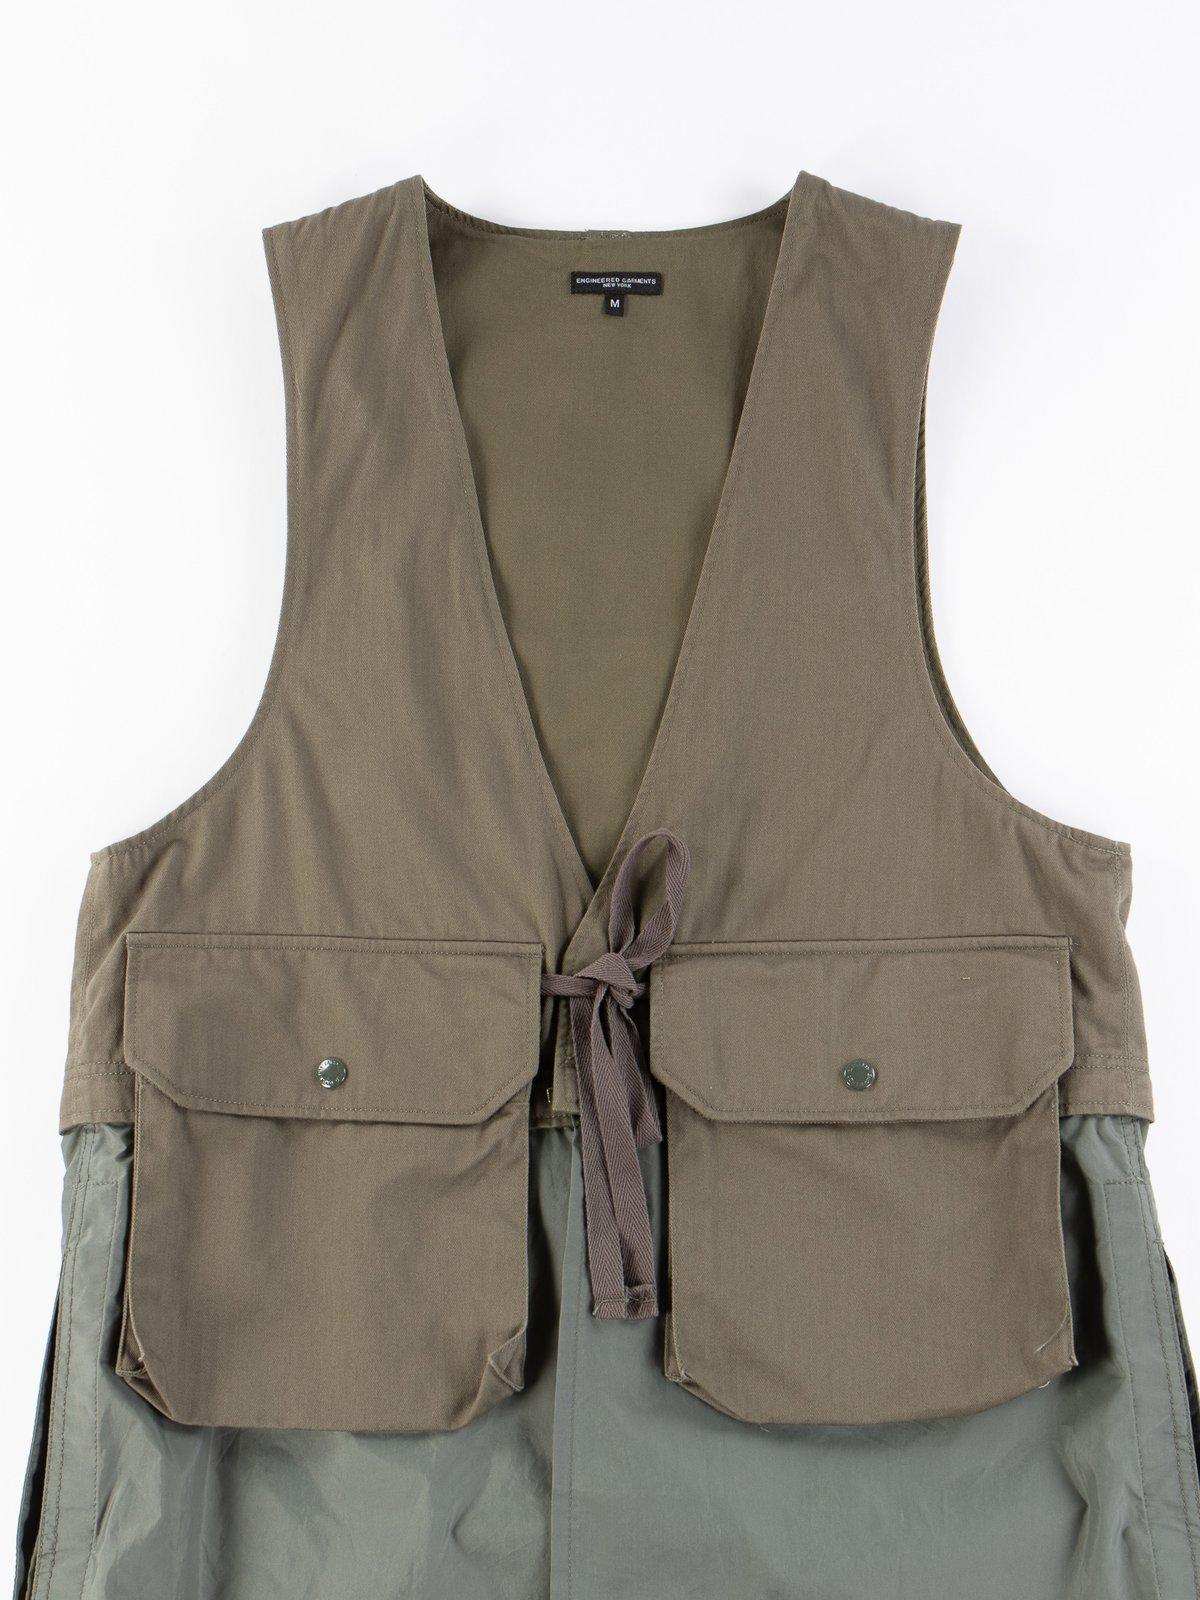 Olive Cotton Herringbone Twill Long Fowl Vest - Image 3